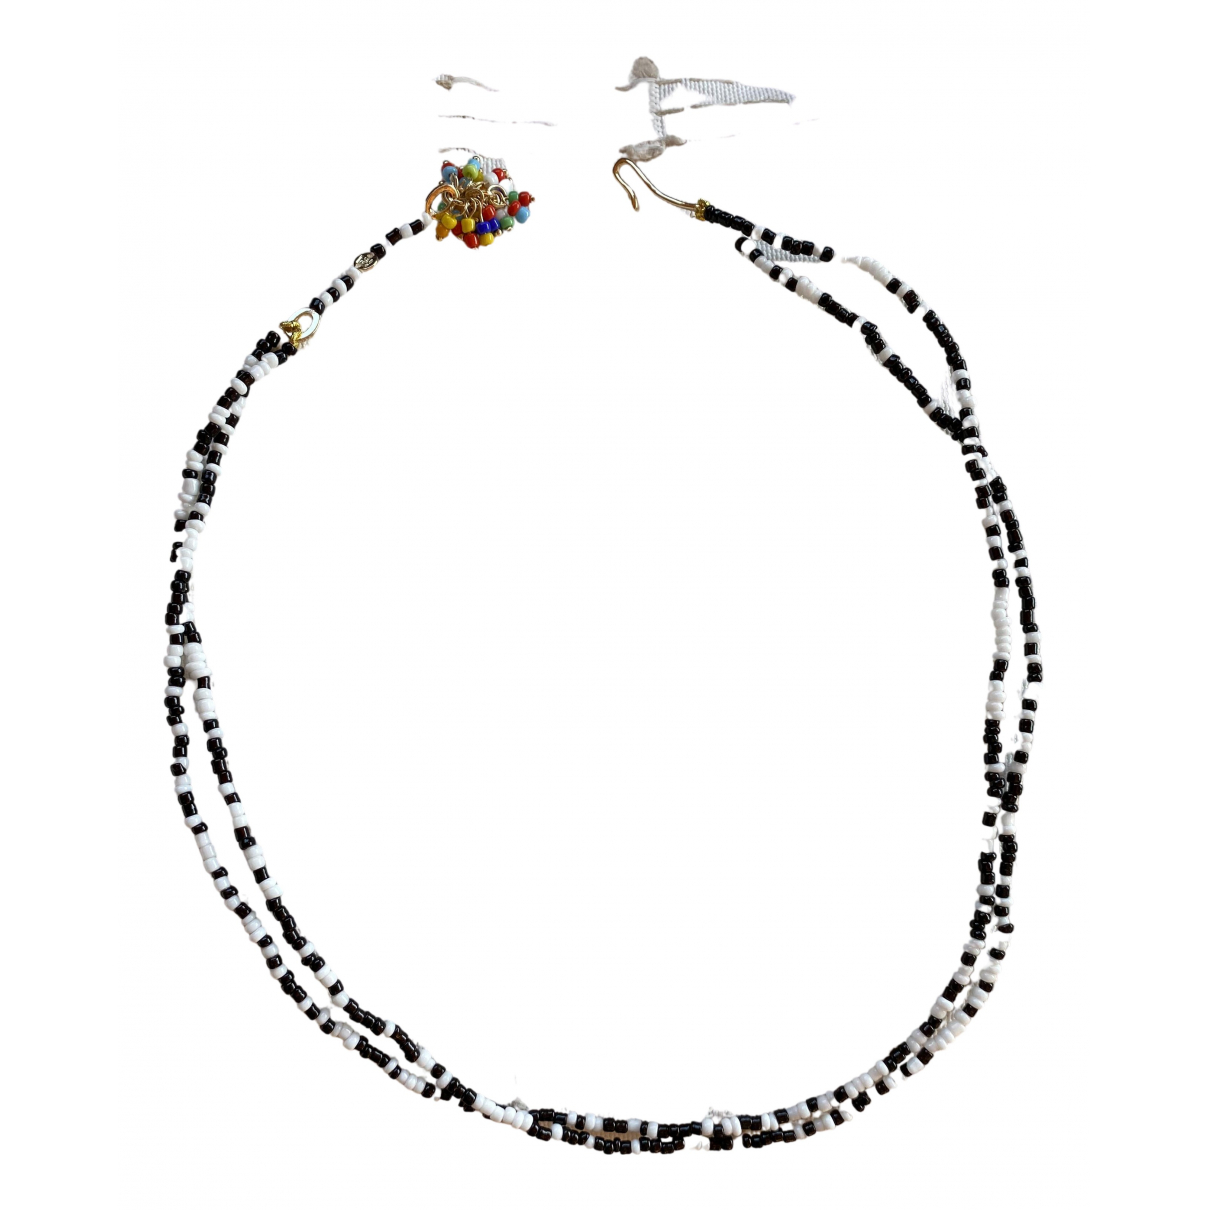 Roxanne Assoulin - Collier   pour femme en perles